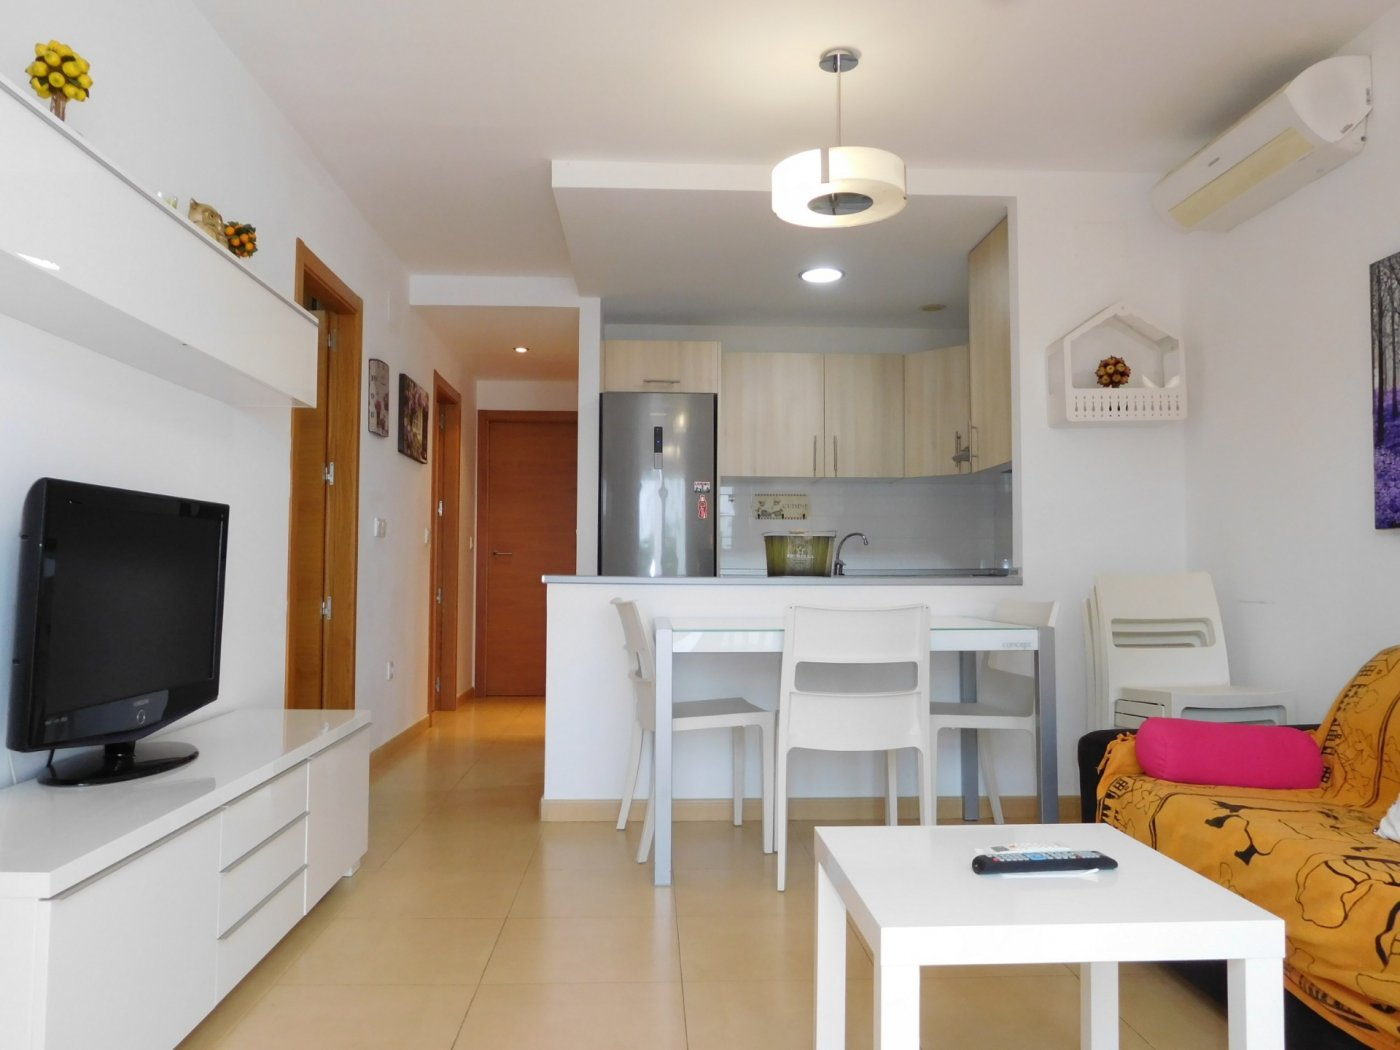 Gallery Image 11 of Apartment For rent in Condado De Alhama, Alhama De Murcia